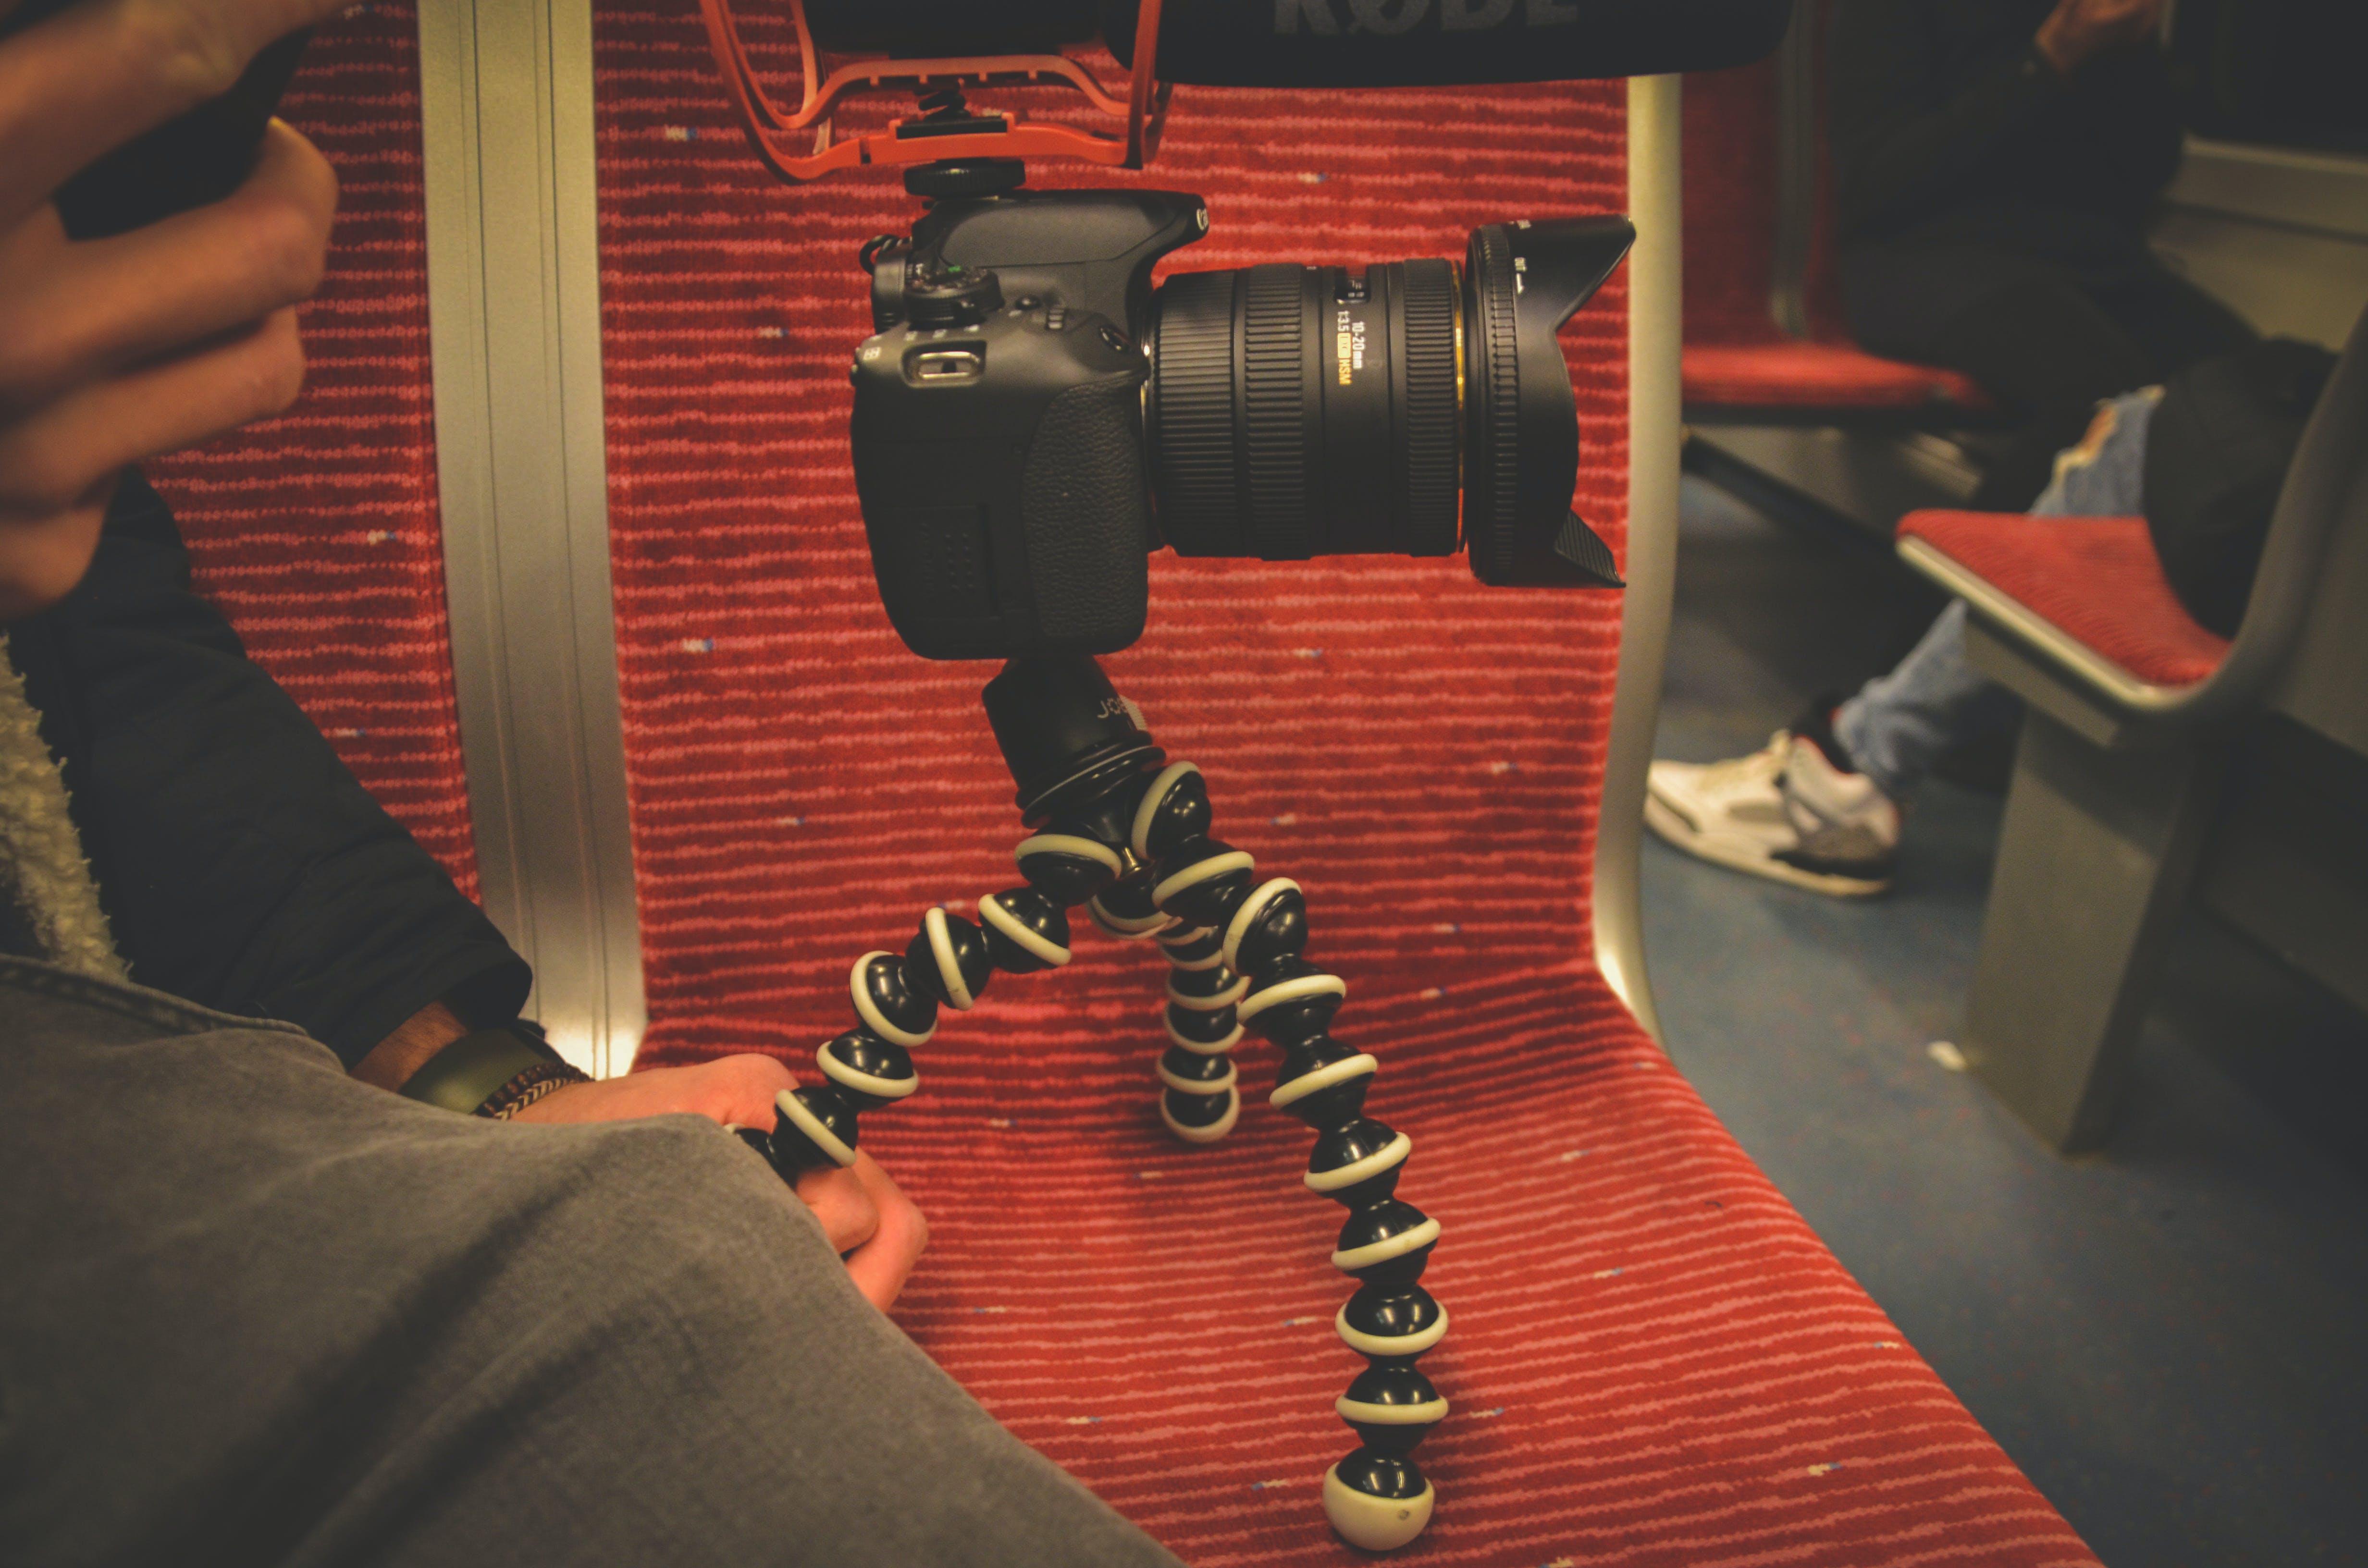 Kostenloses Stock Foto zu arbeiten, bahnen, digitalkamera, filmen